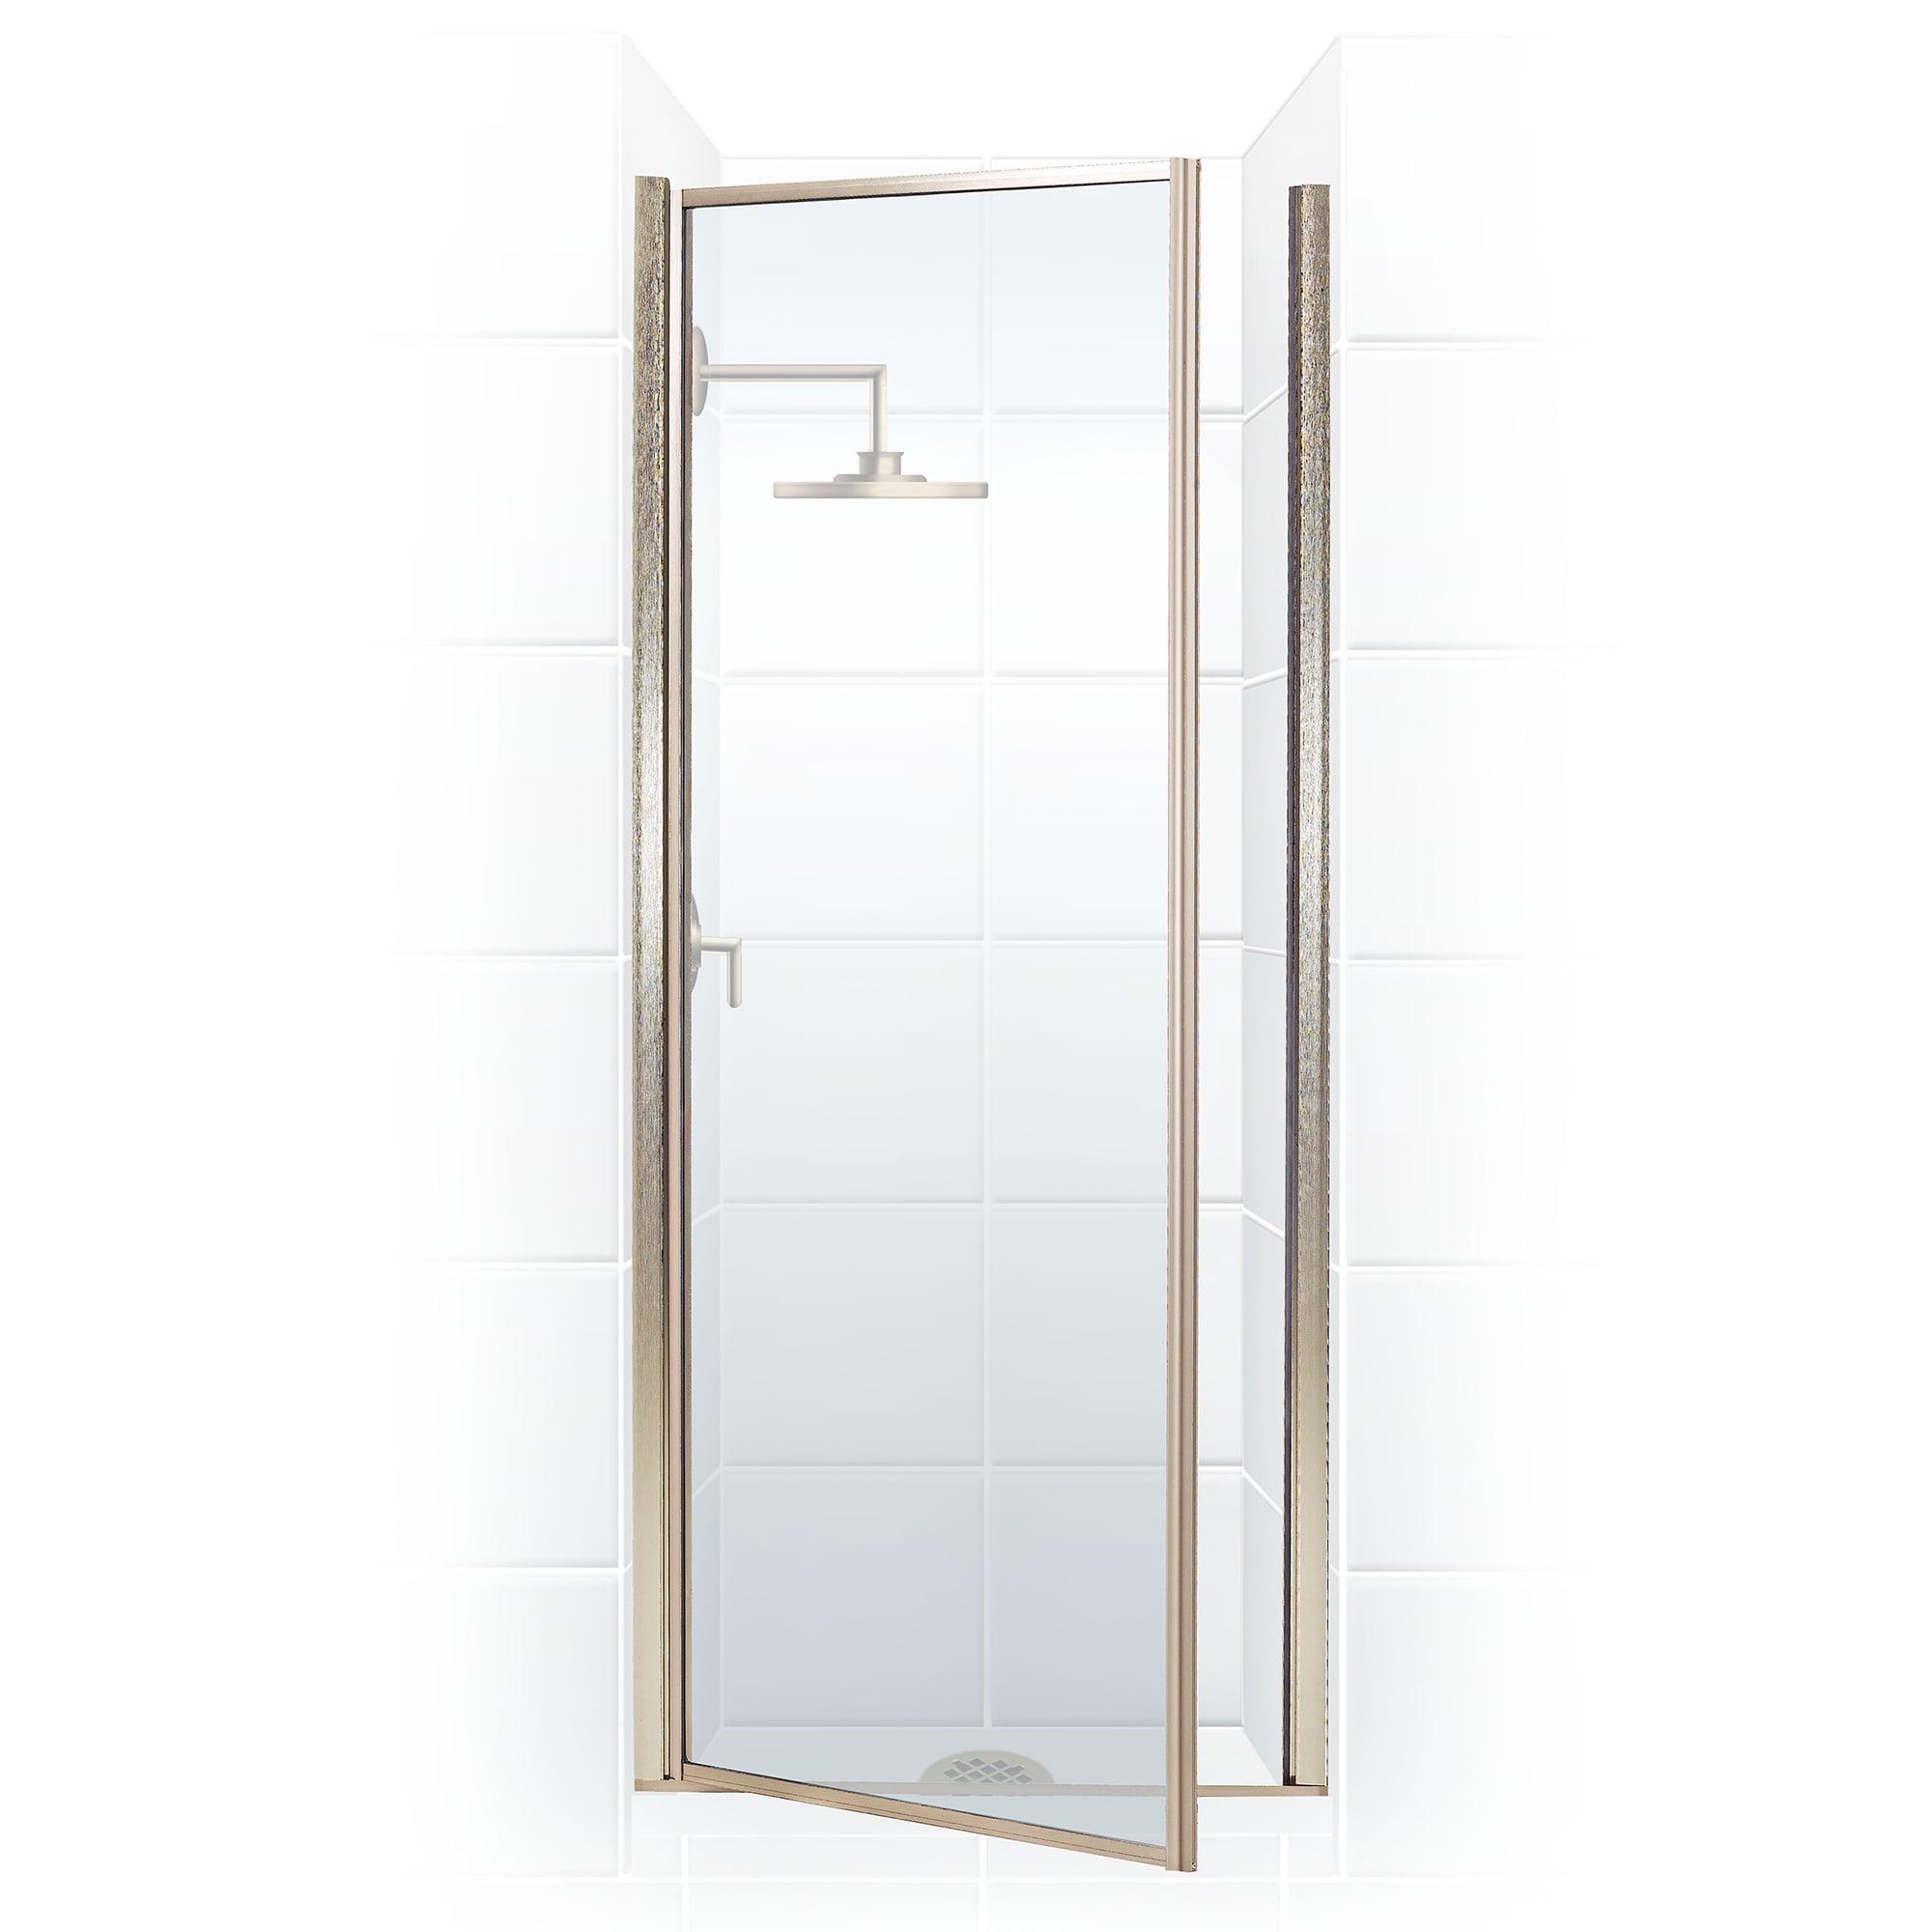 Coastal Shower Doors L30 69o C Black Bronze Legend Series 30